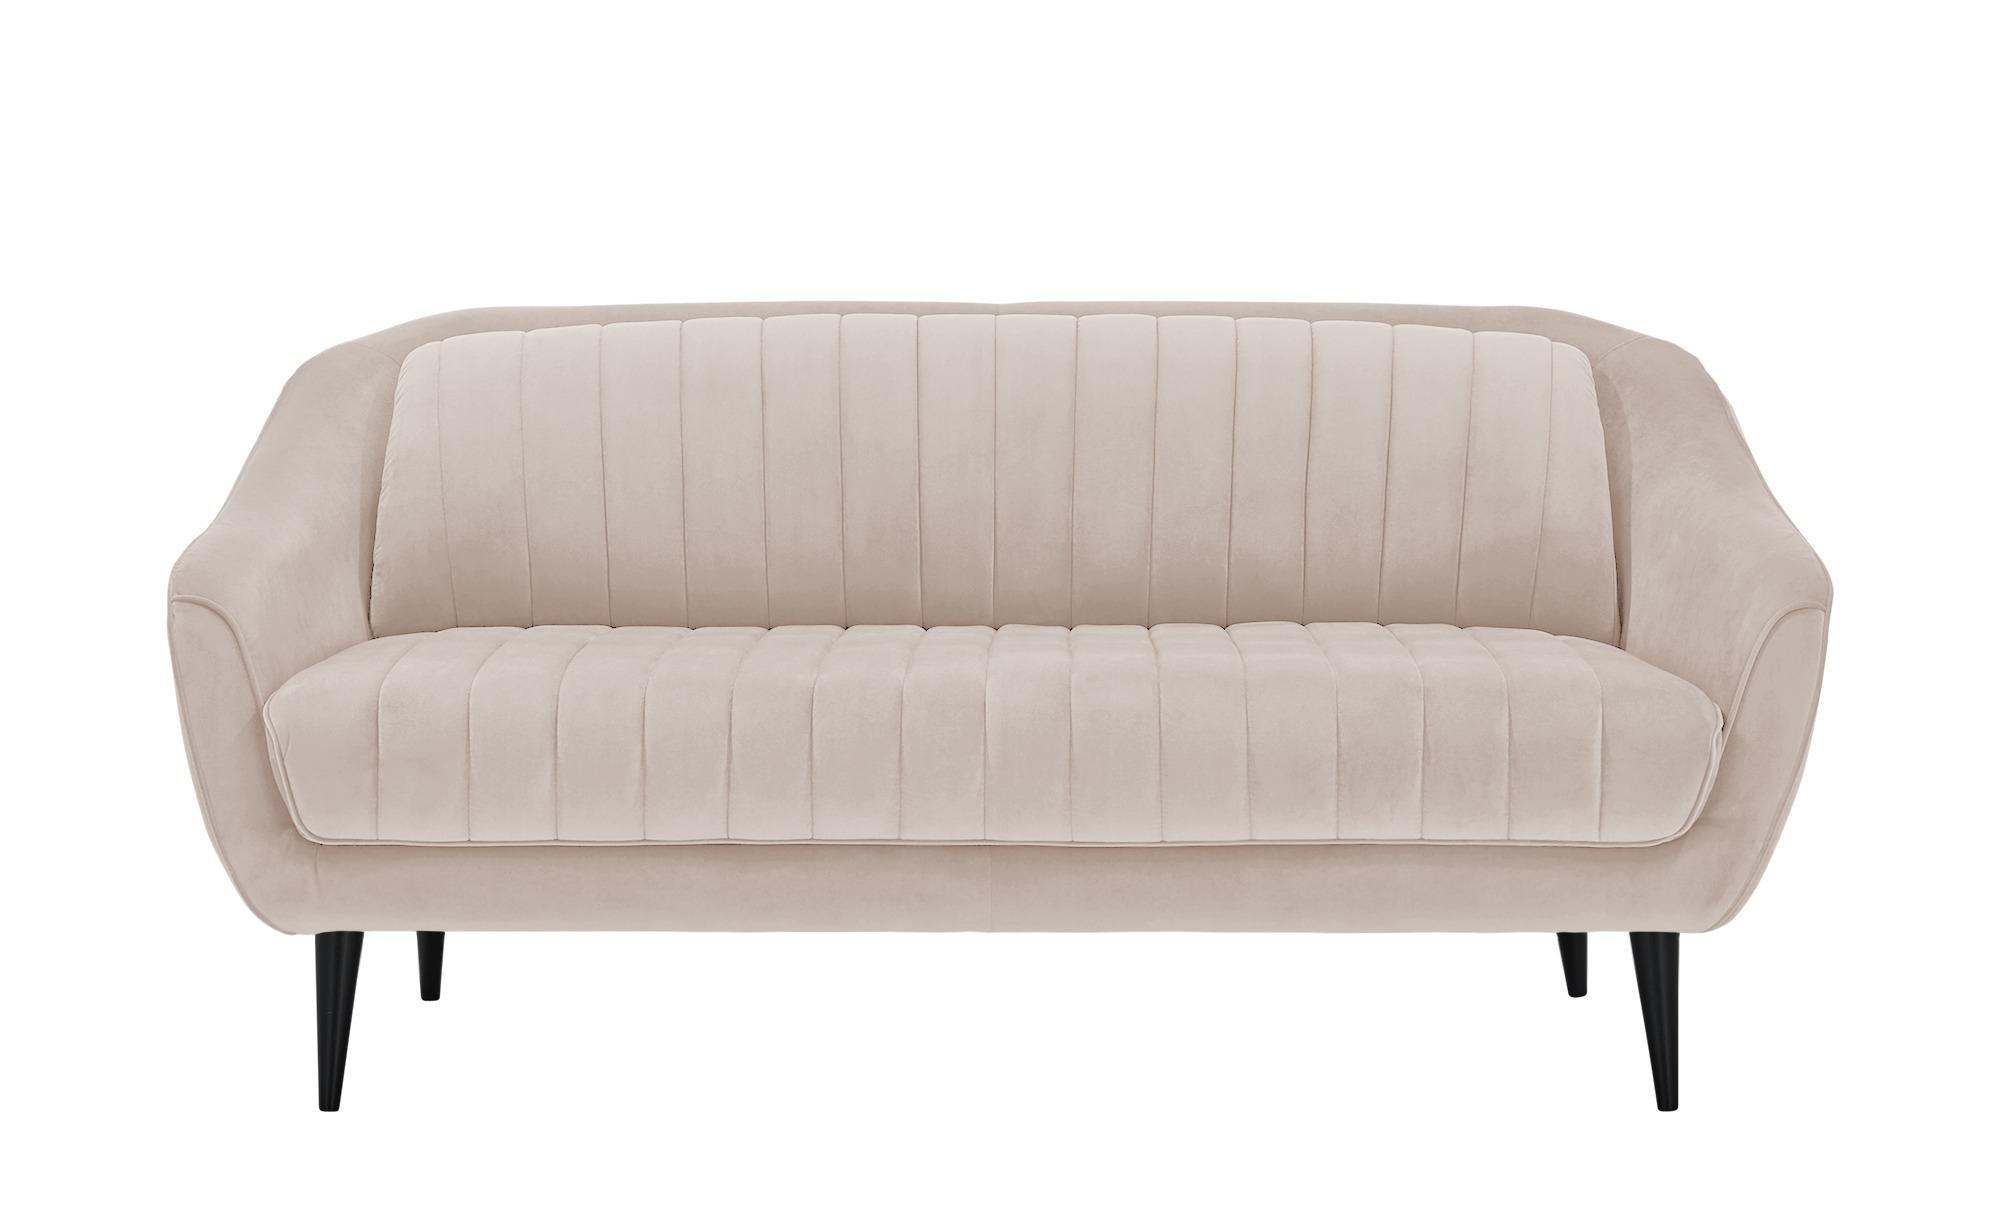 Sofa  Sophia ¦ rosa/pink ¦ Maße (cm): B: 190 H: 83 T: 90 Polstermöbel > Sofas > Einzelsofas - Höffner